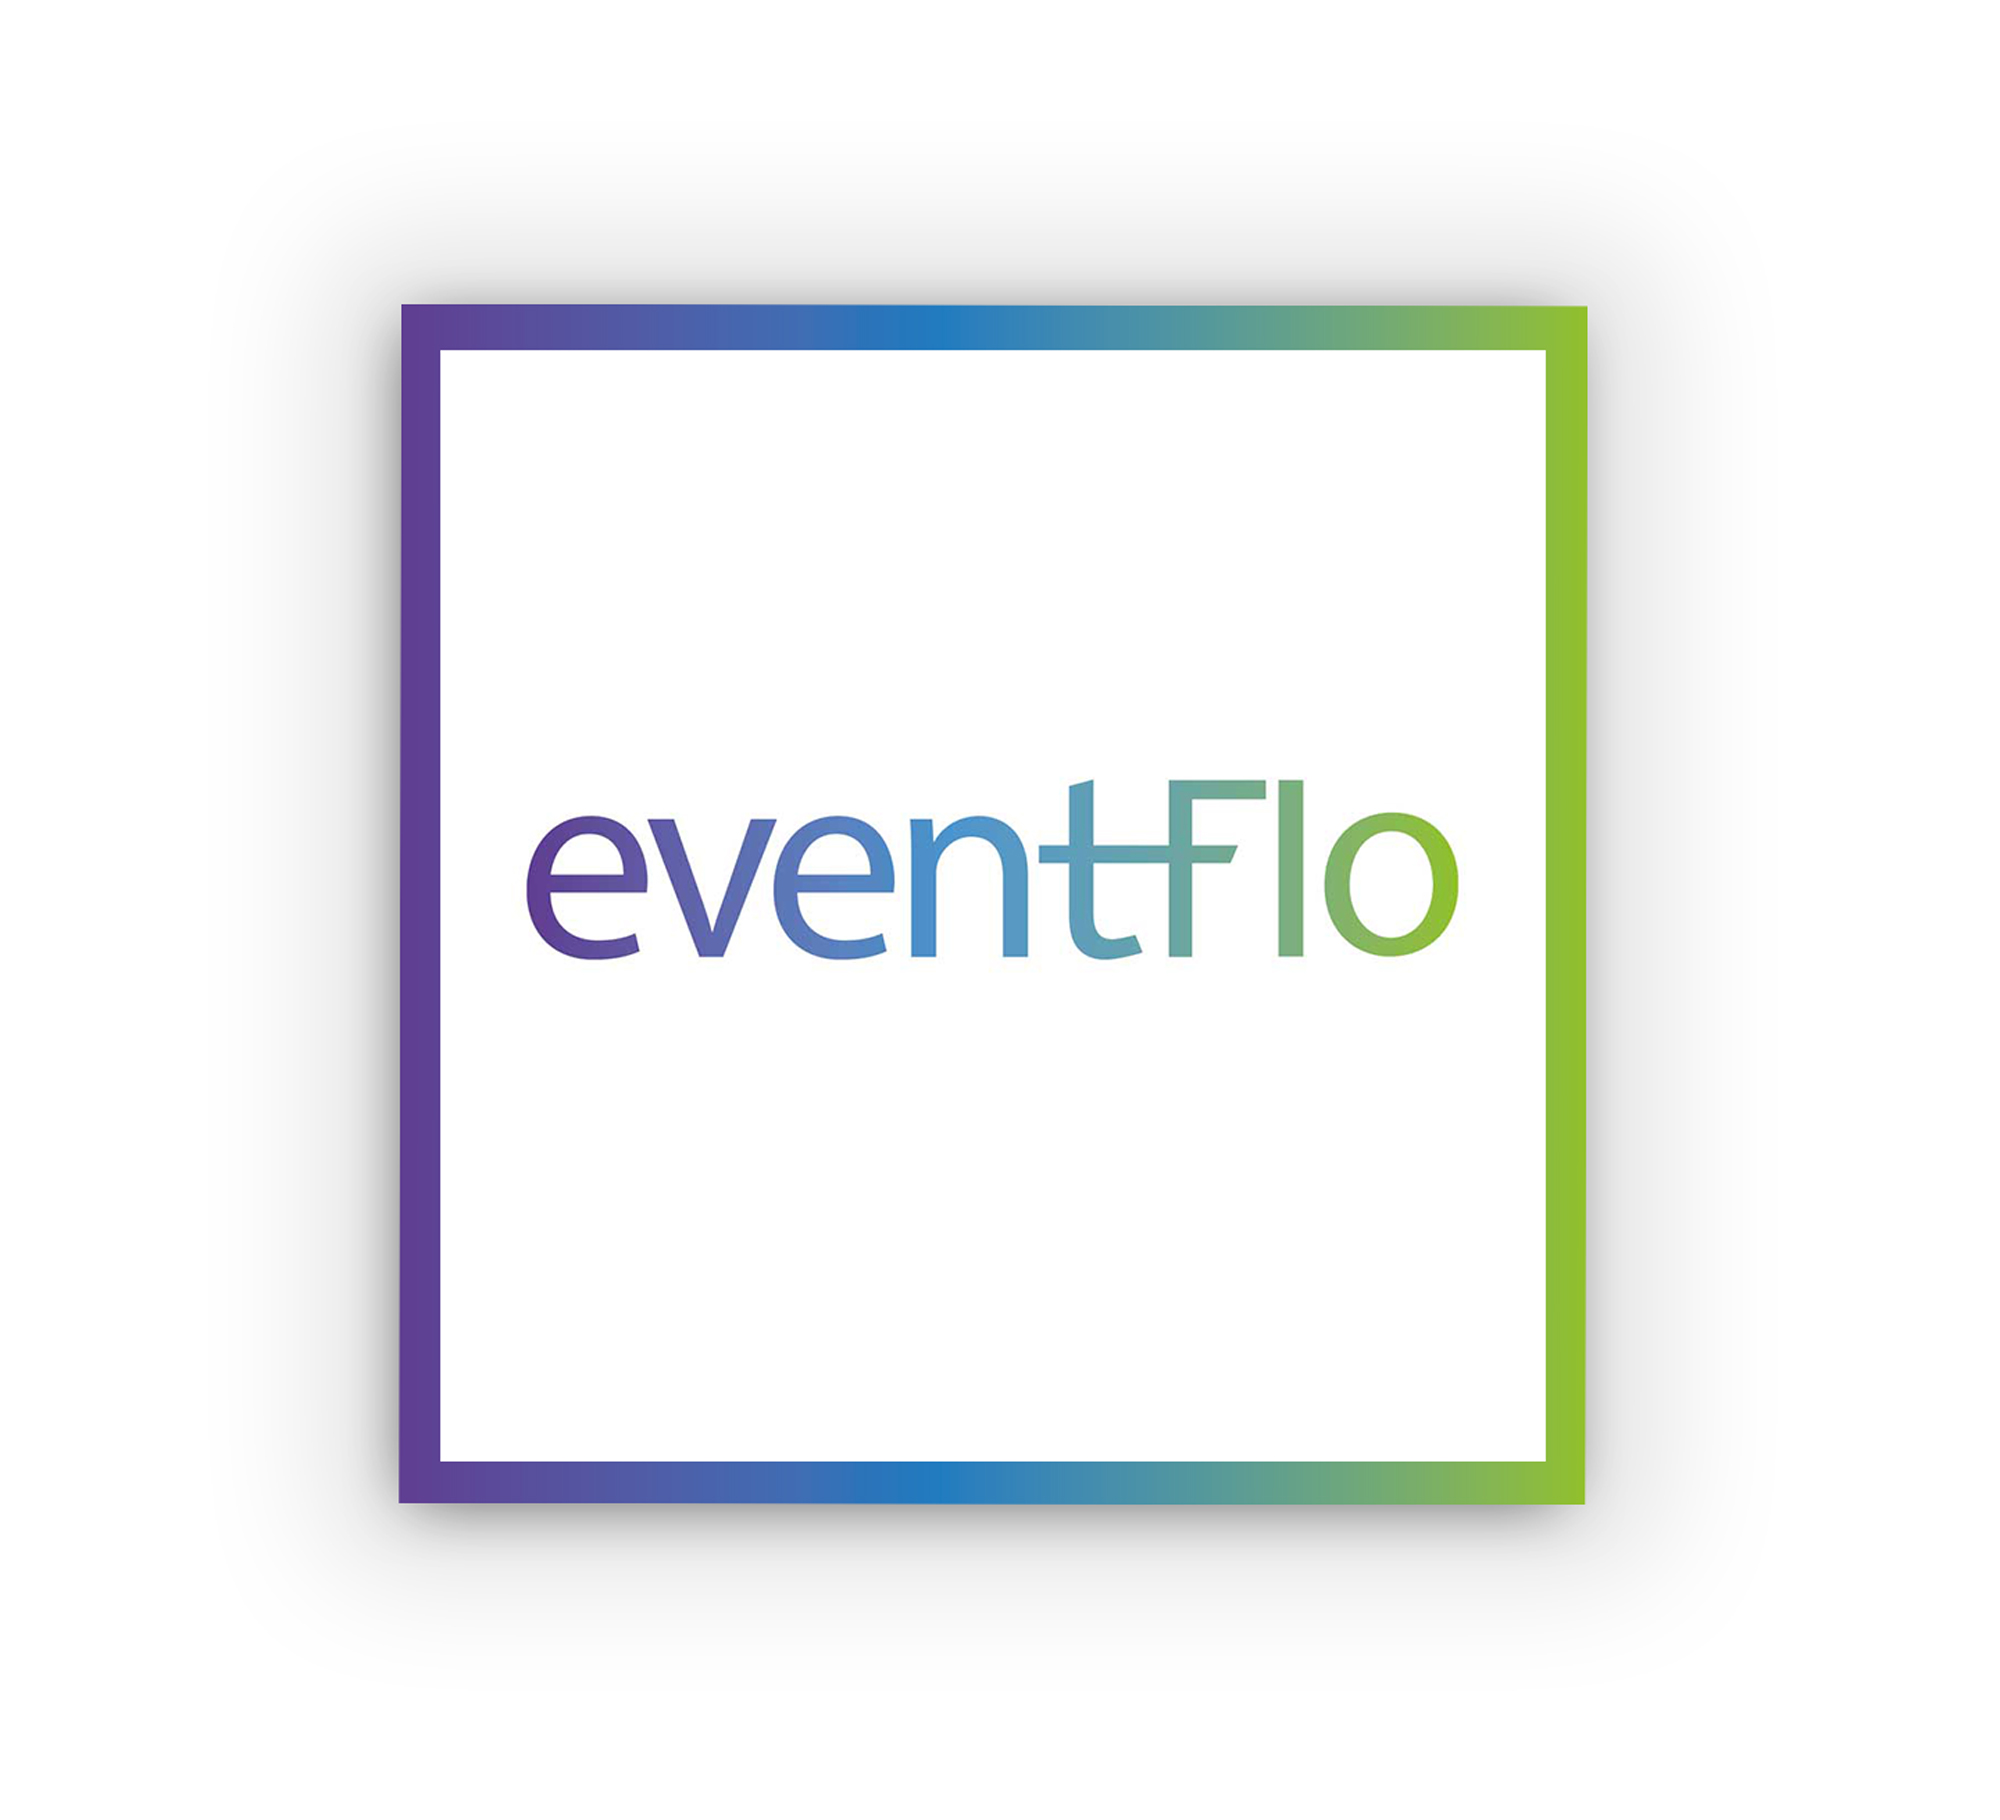 eventflo_white